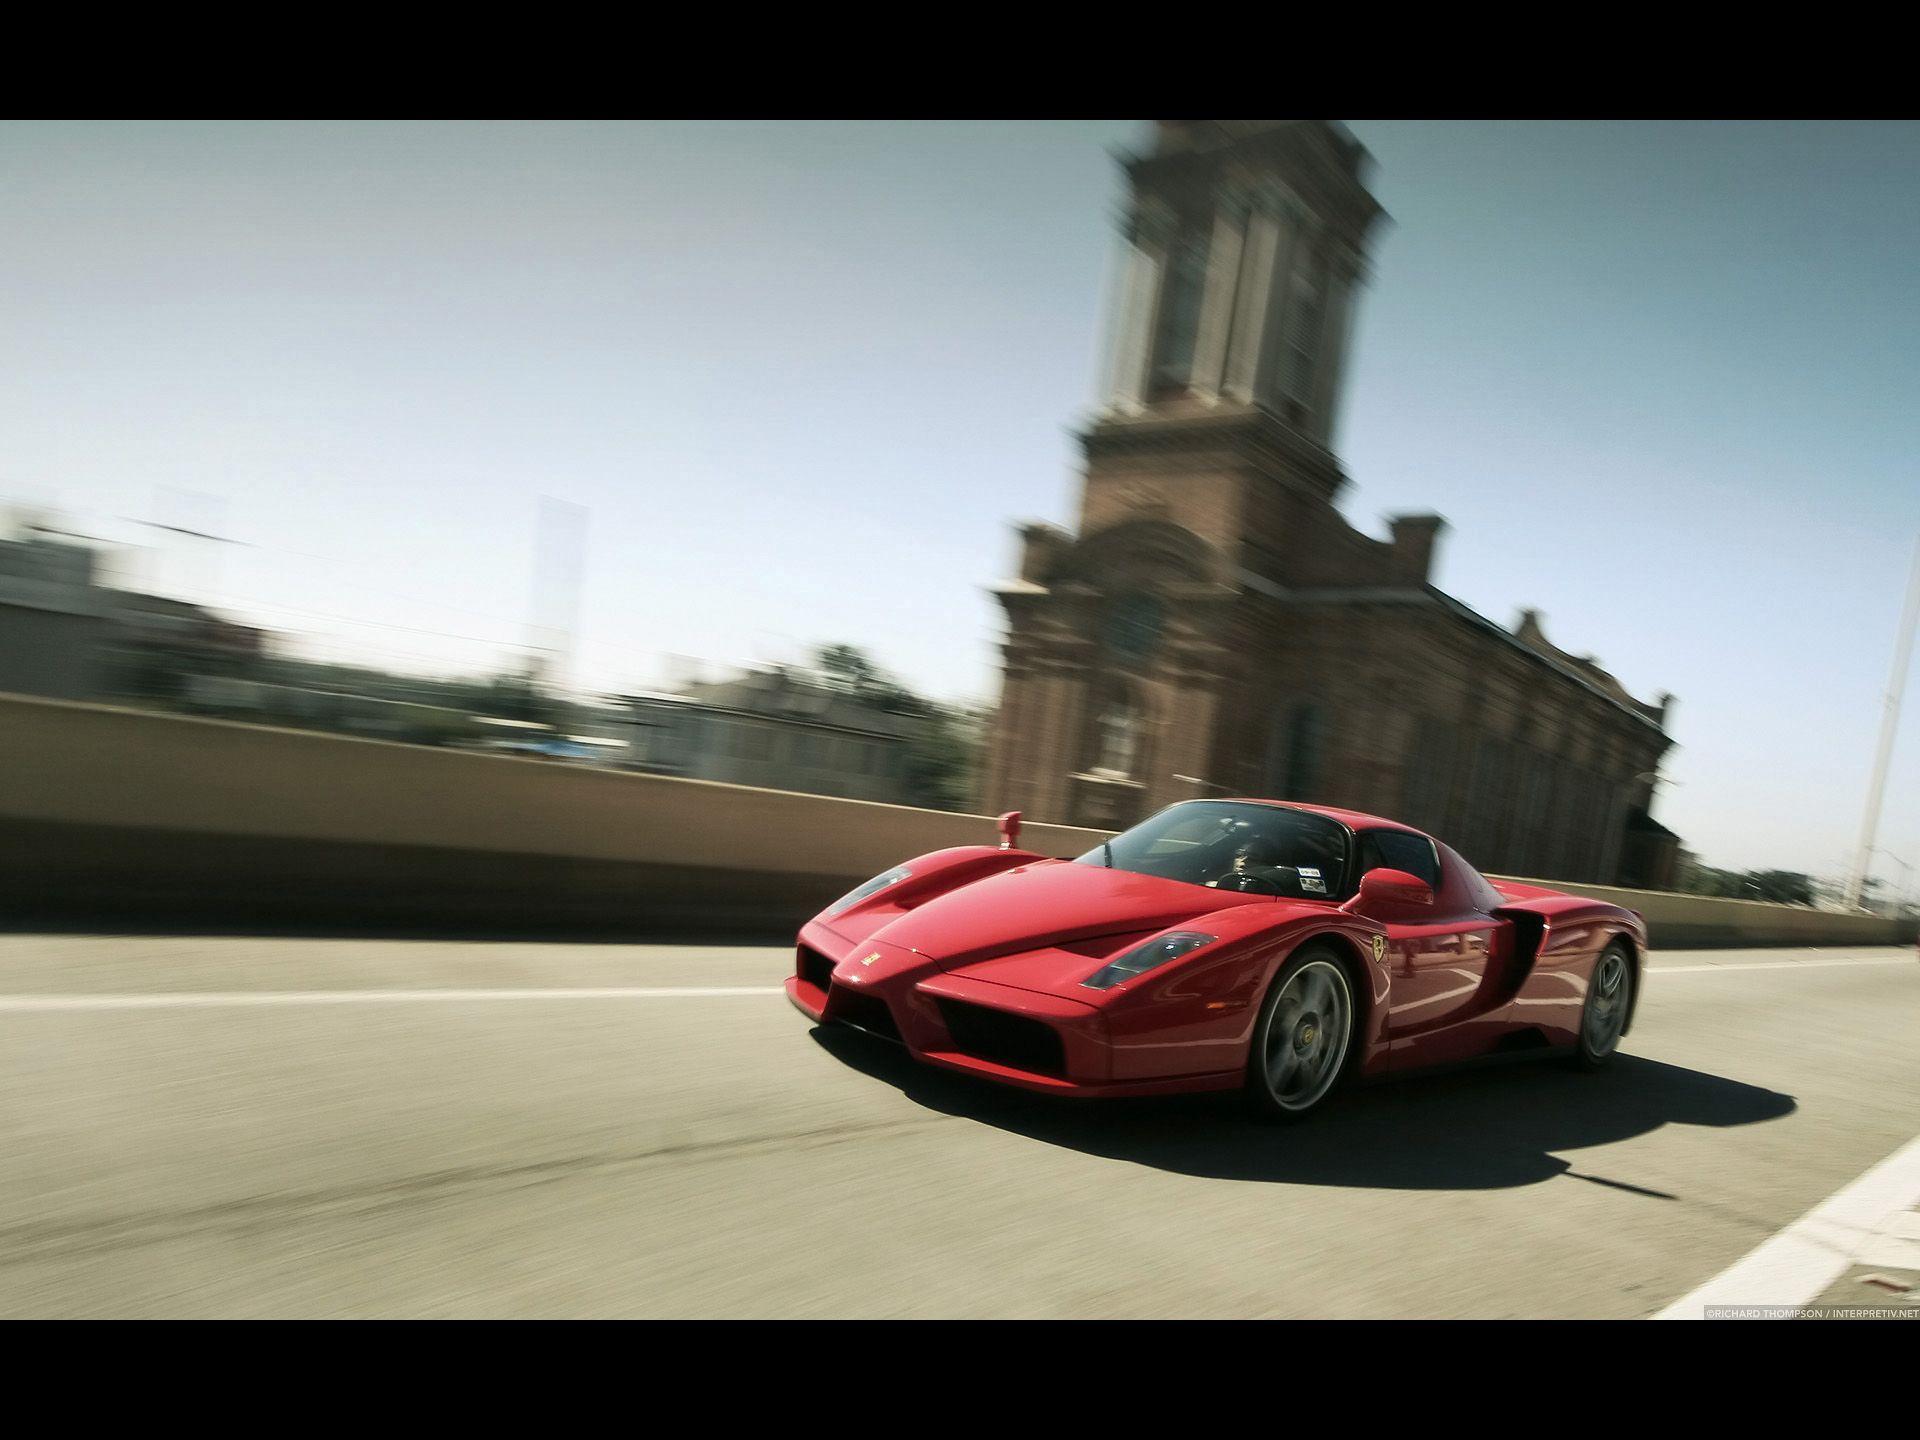 Ferrari Enzo Hd Picture 557392166 Clarisse Garrud